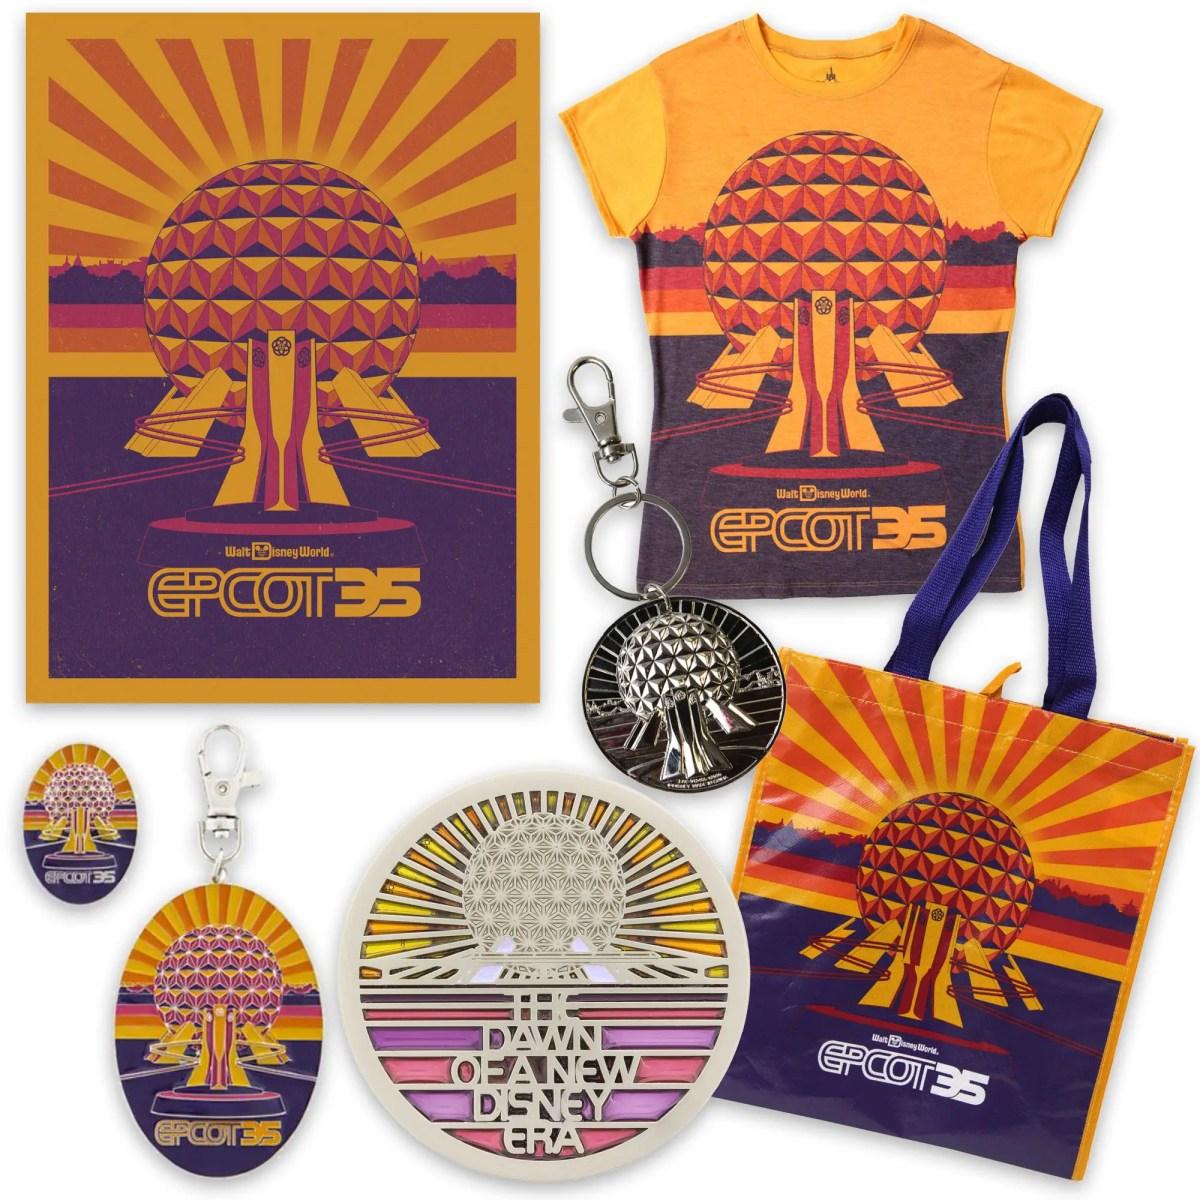 Epcot 35th Anniversary Merchandise